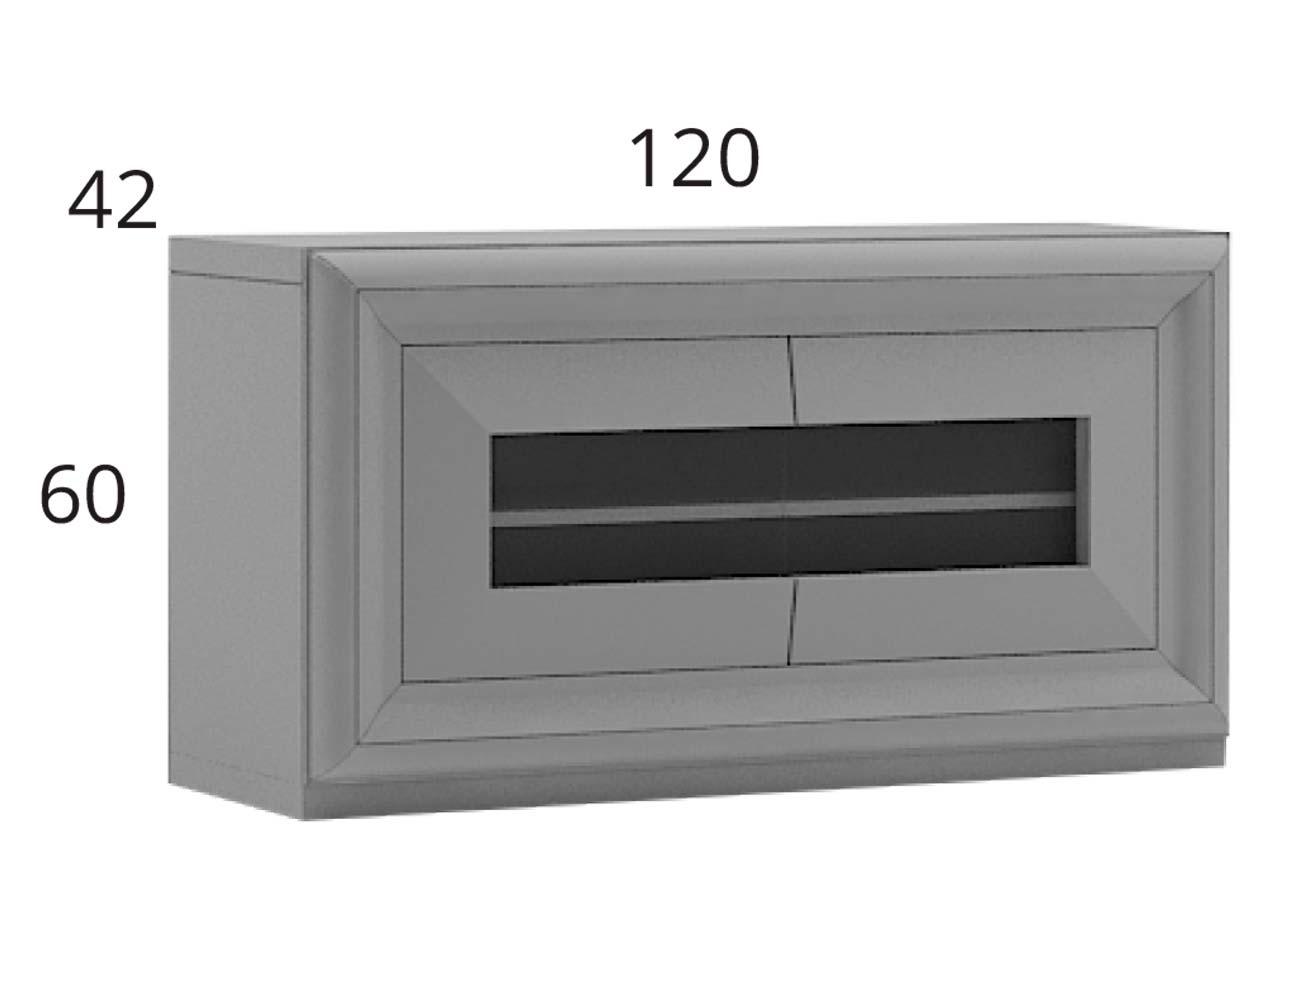 A0232